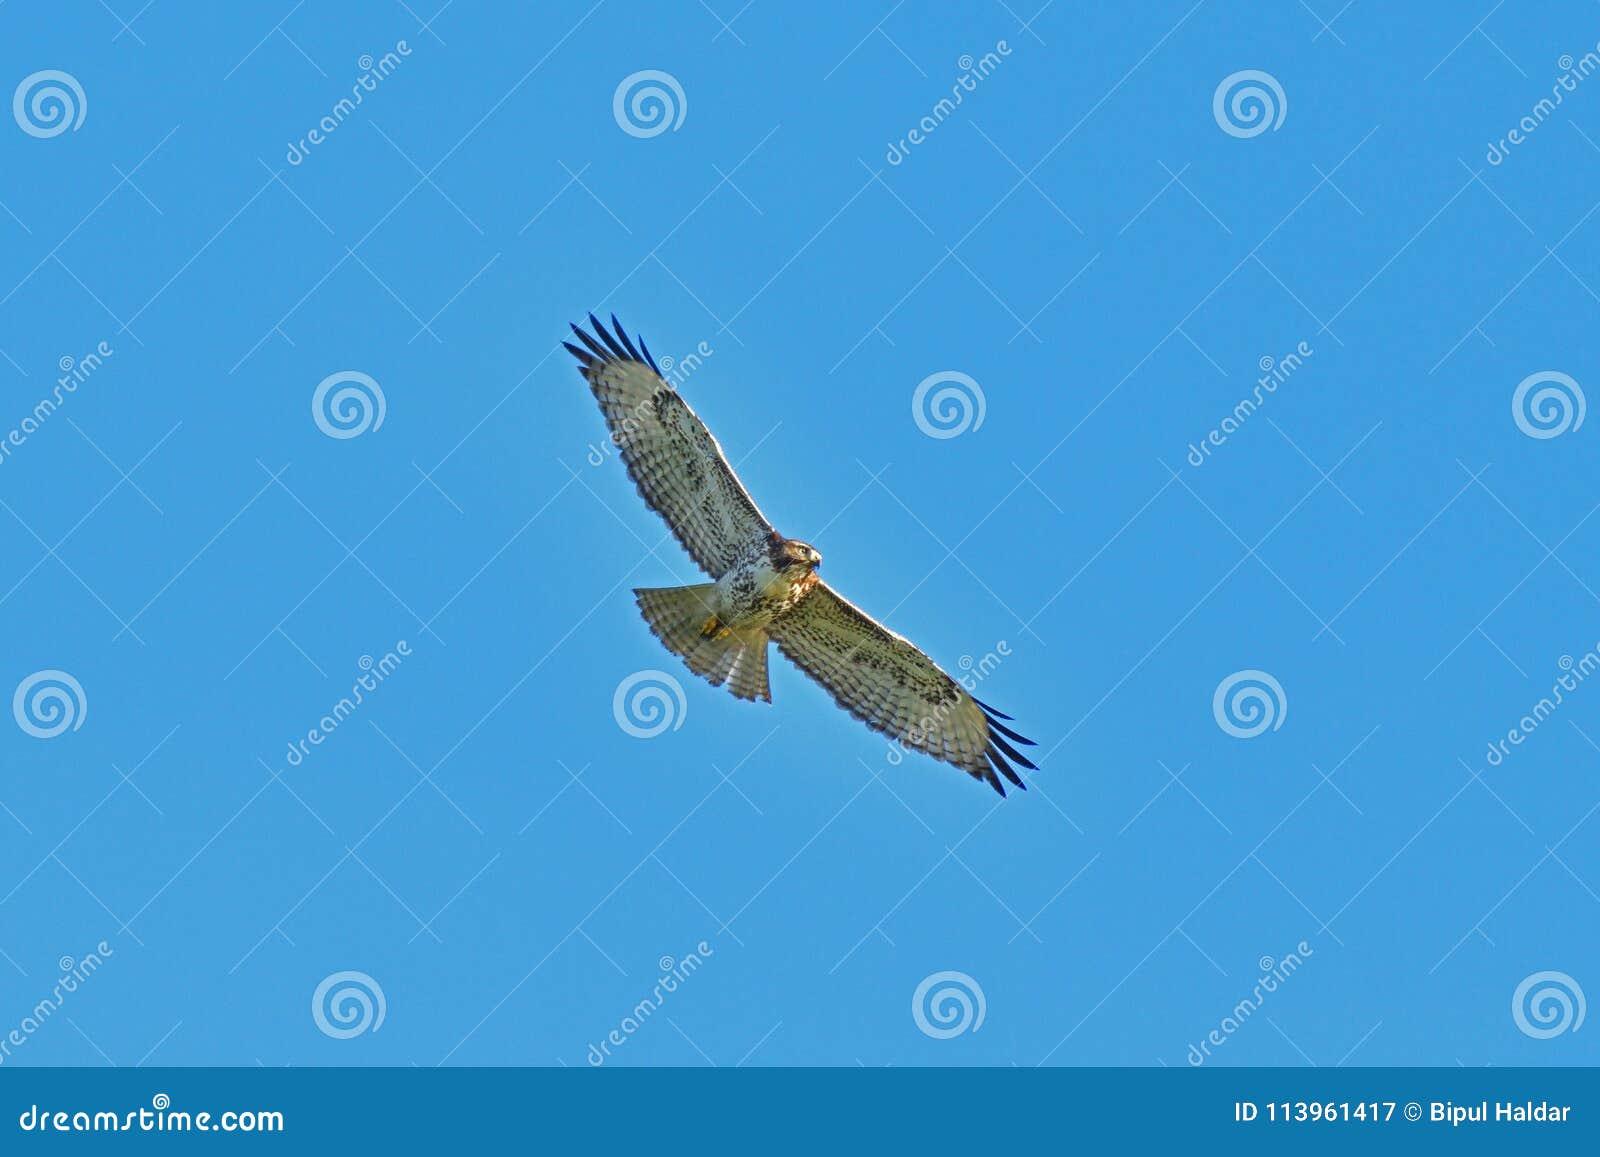 A Hawk Hovering